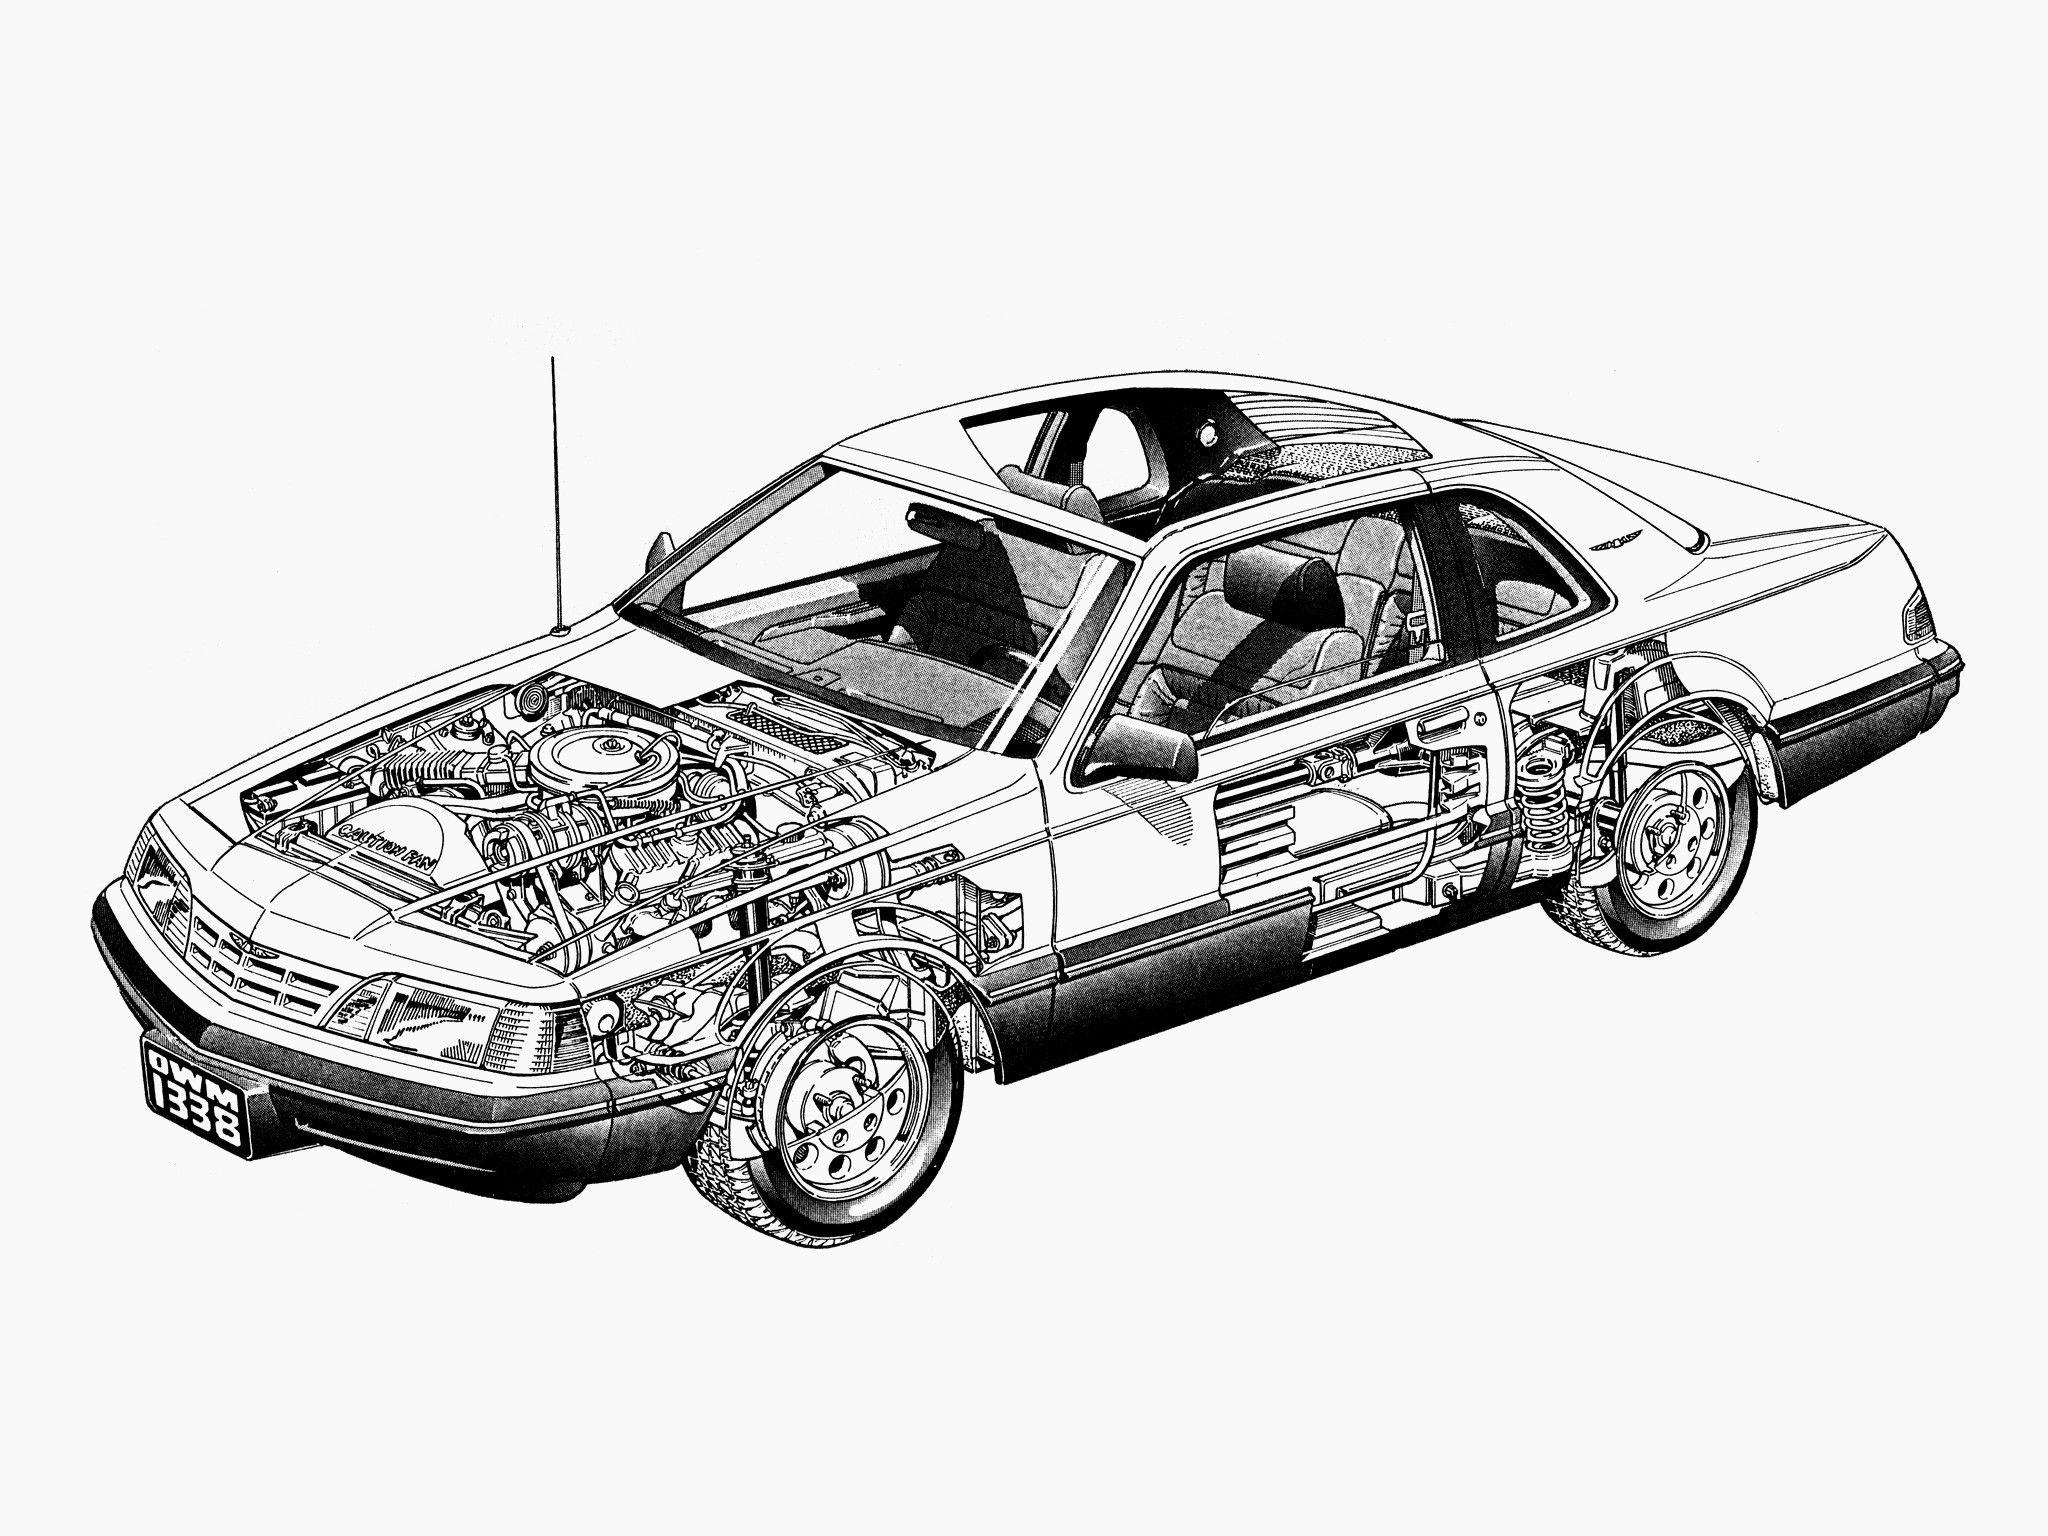 Ford Thunderbird cutaway drawing